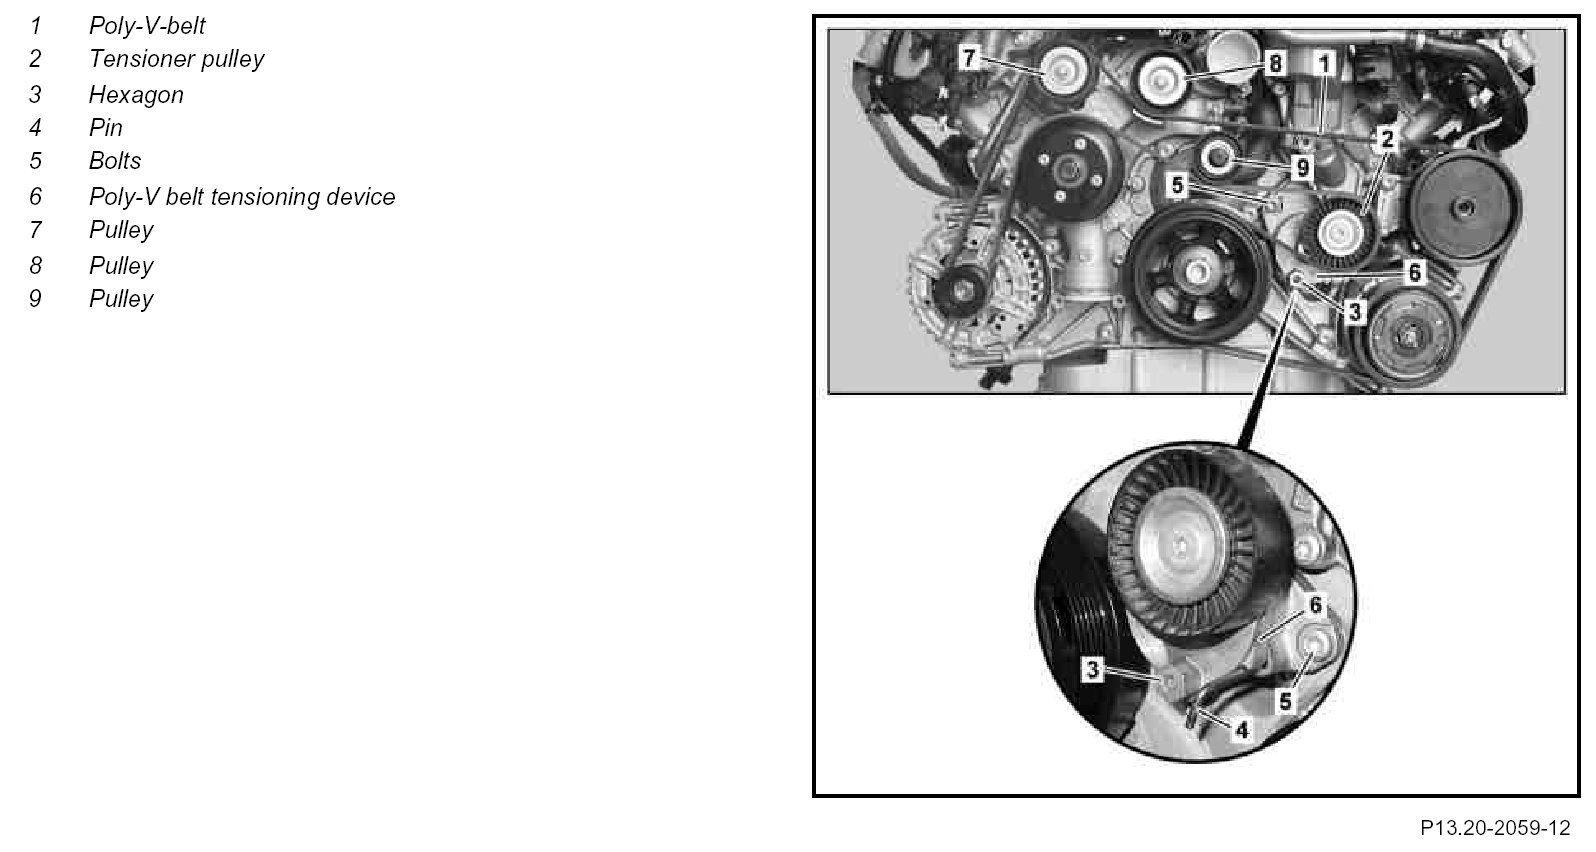 mercedes c63 drive belt diagram house wiring diagram symbols u2022 rh mollusksurfshopnyc com 2006 mercedes benz r350 belt diagram 2006 mercedes benz c230 belt diagram